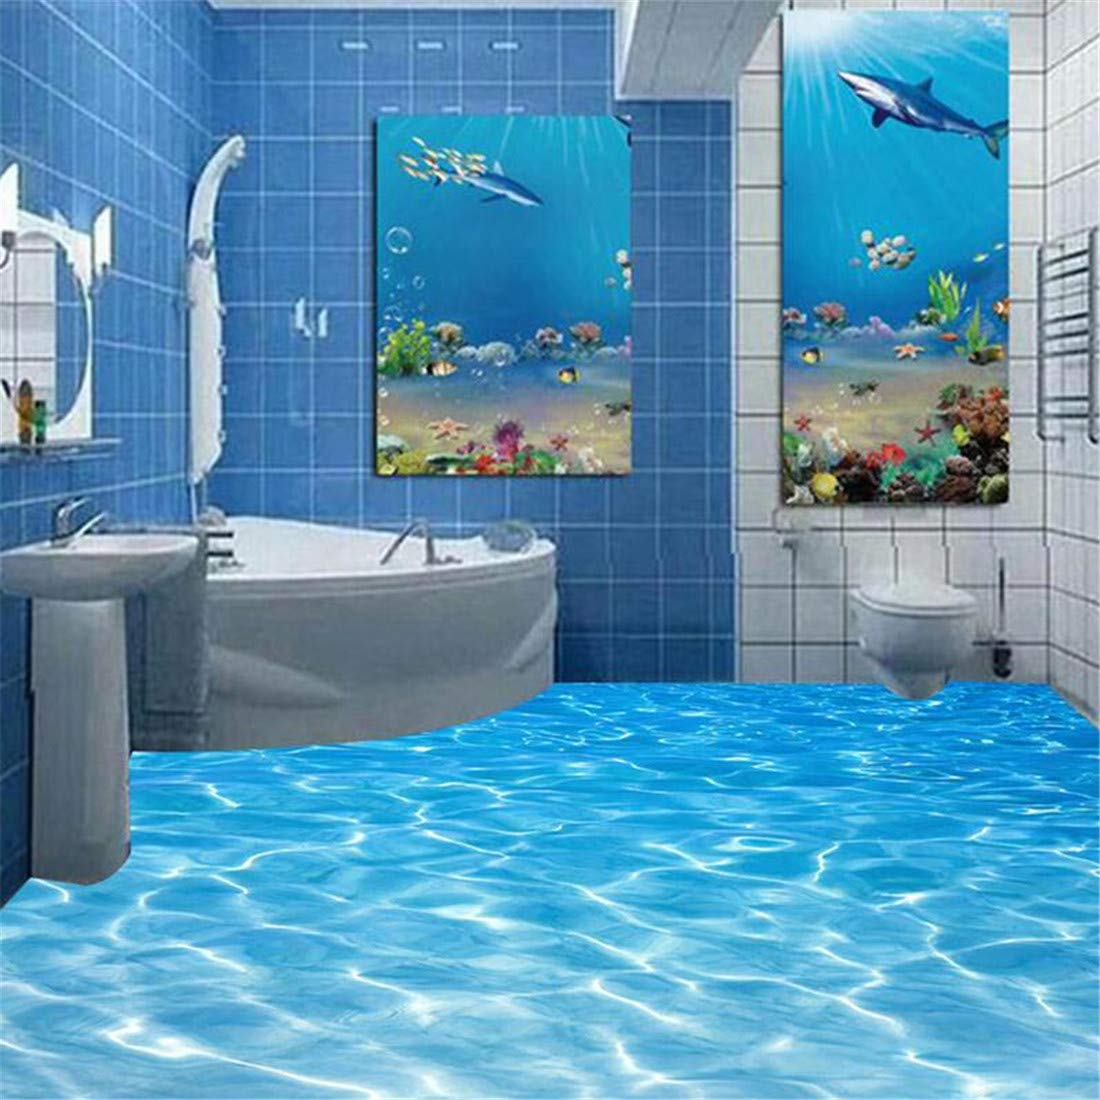 Benutzerdefinierte 3D Boden Wandbilder Tapete Meerwasser Oberfläche Oberfläche Oberfläche Ripple Fototapete PVC Wasserdichte Badezimmerboden Aufkleber Vinyl Tapeten, 300  210 cm B07L13PYX8 Wandtattoos & Wandbilder 13c943